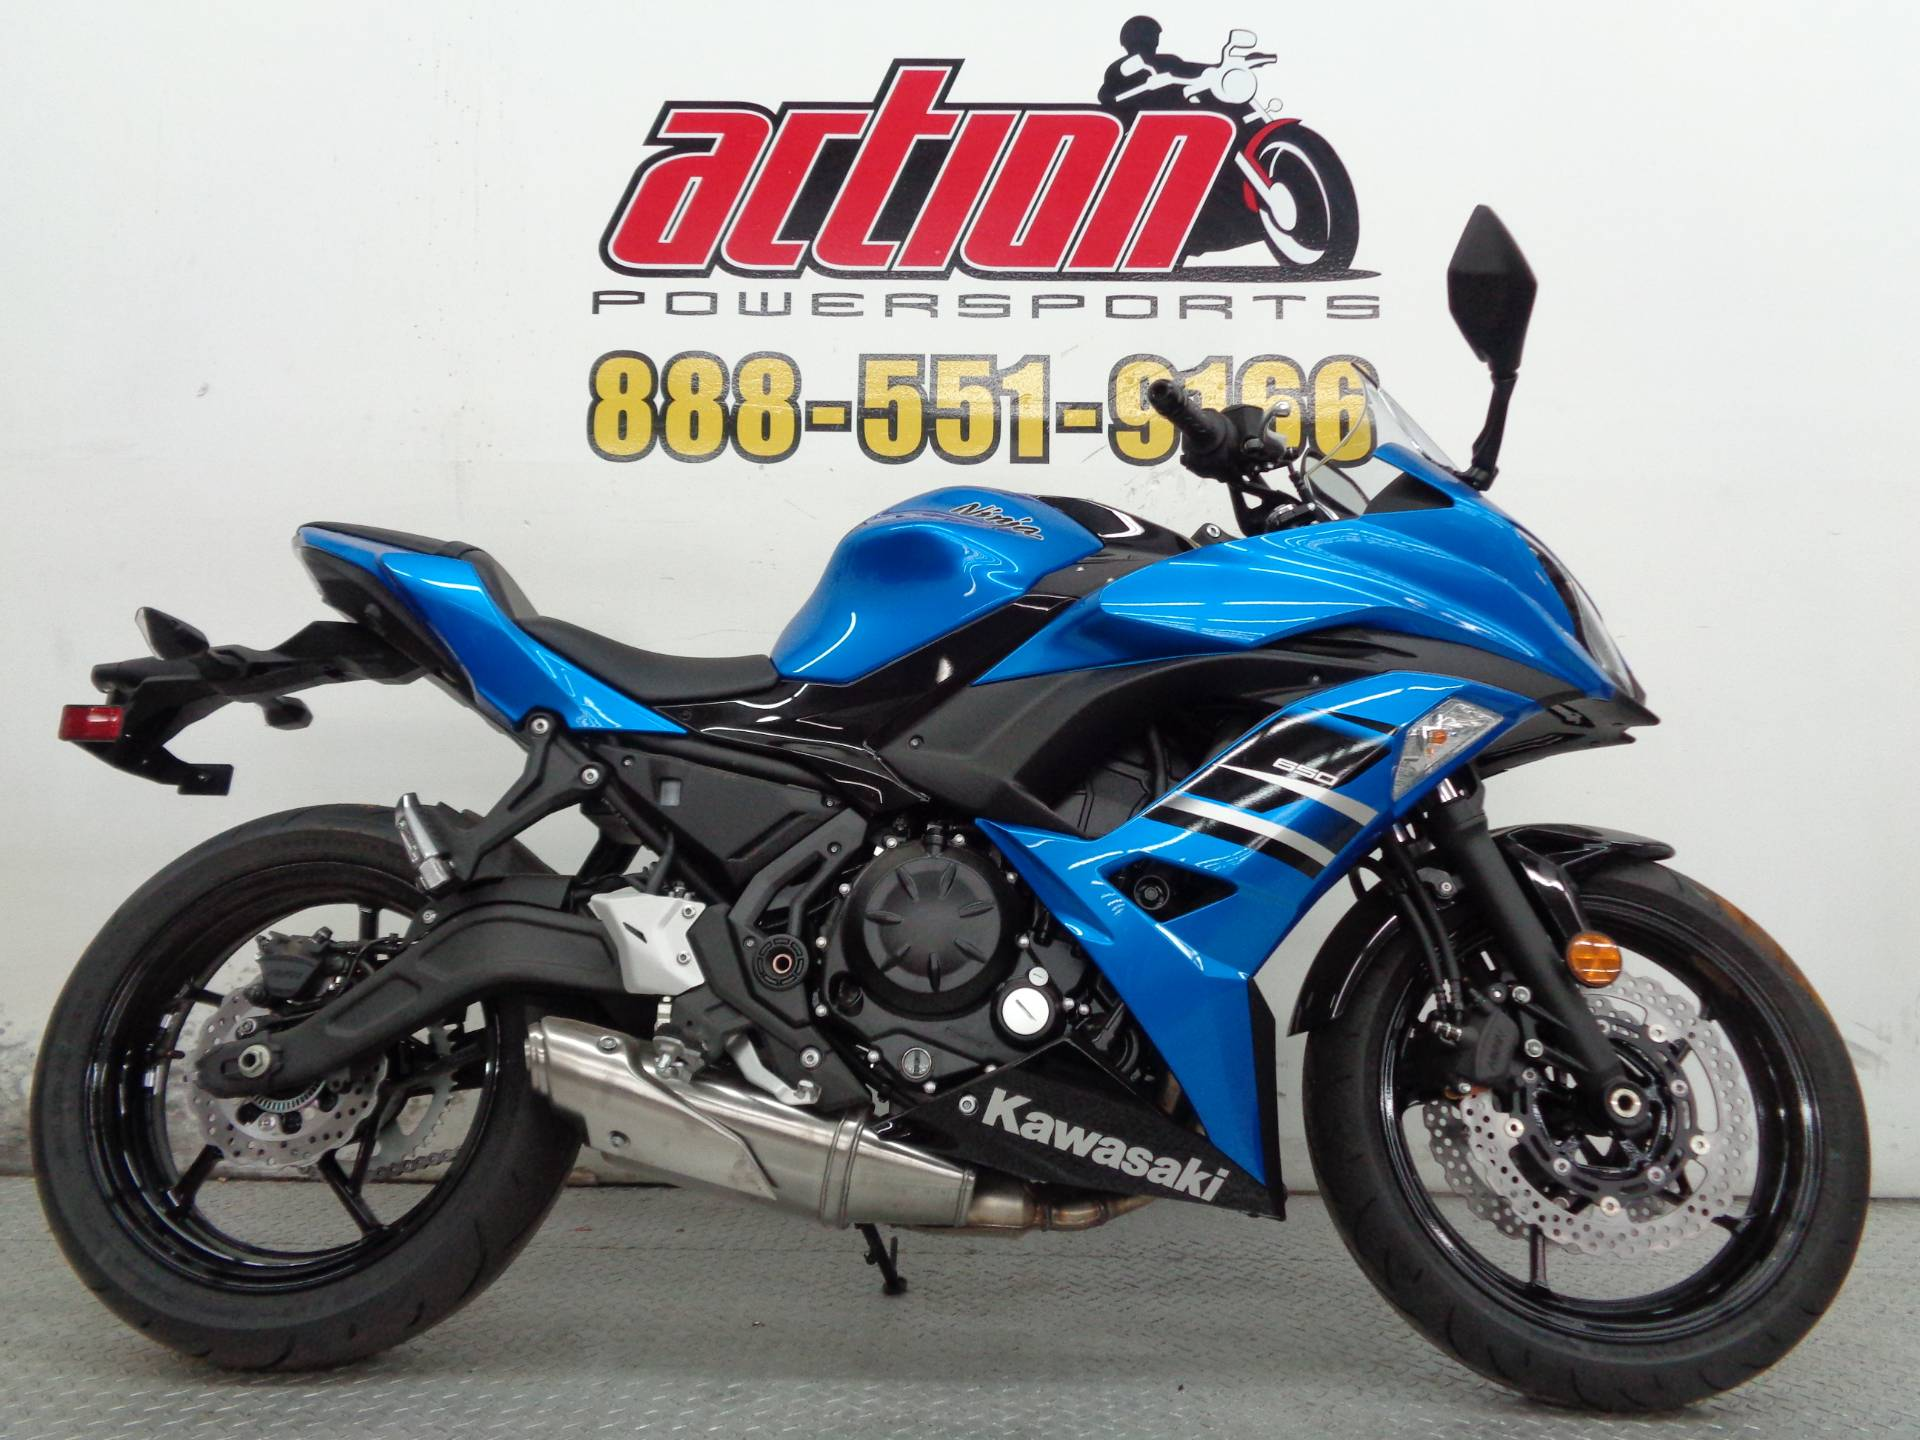 New 2018 Kawasaki Ninja 650 Motorcycles in Tulsa, OK | Stock Number ...